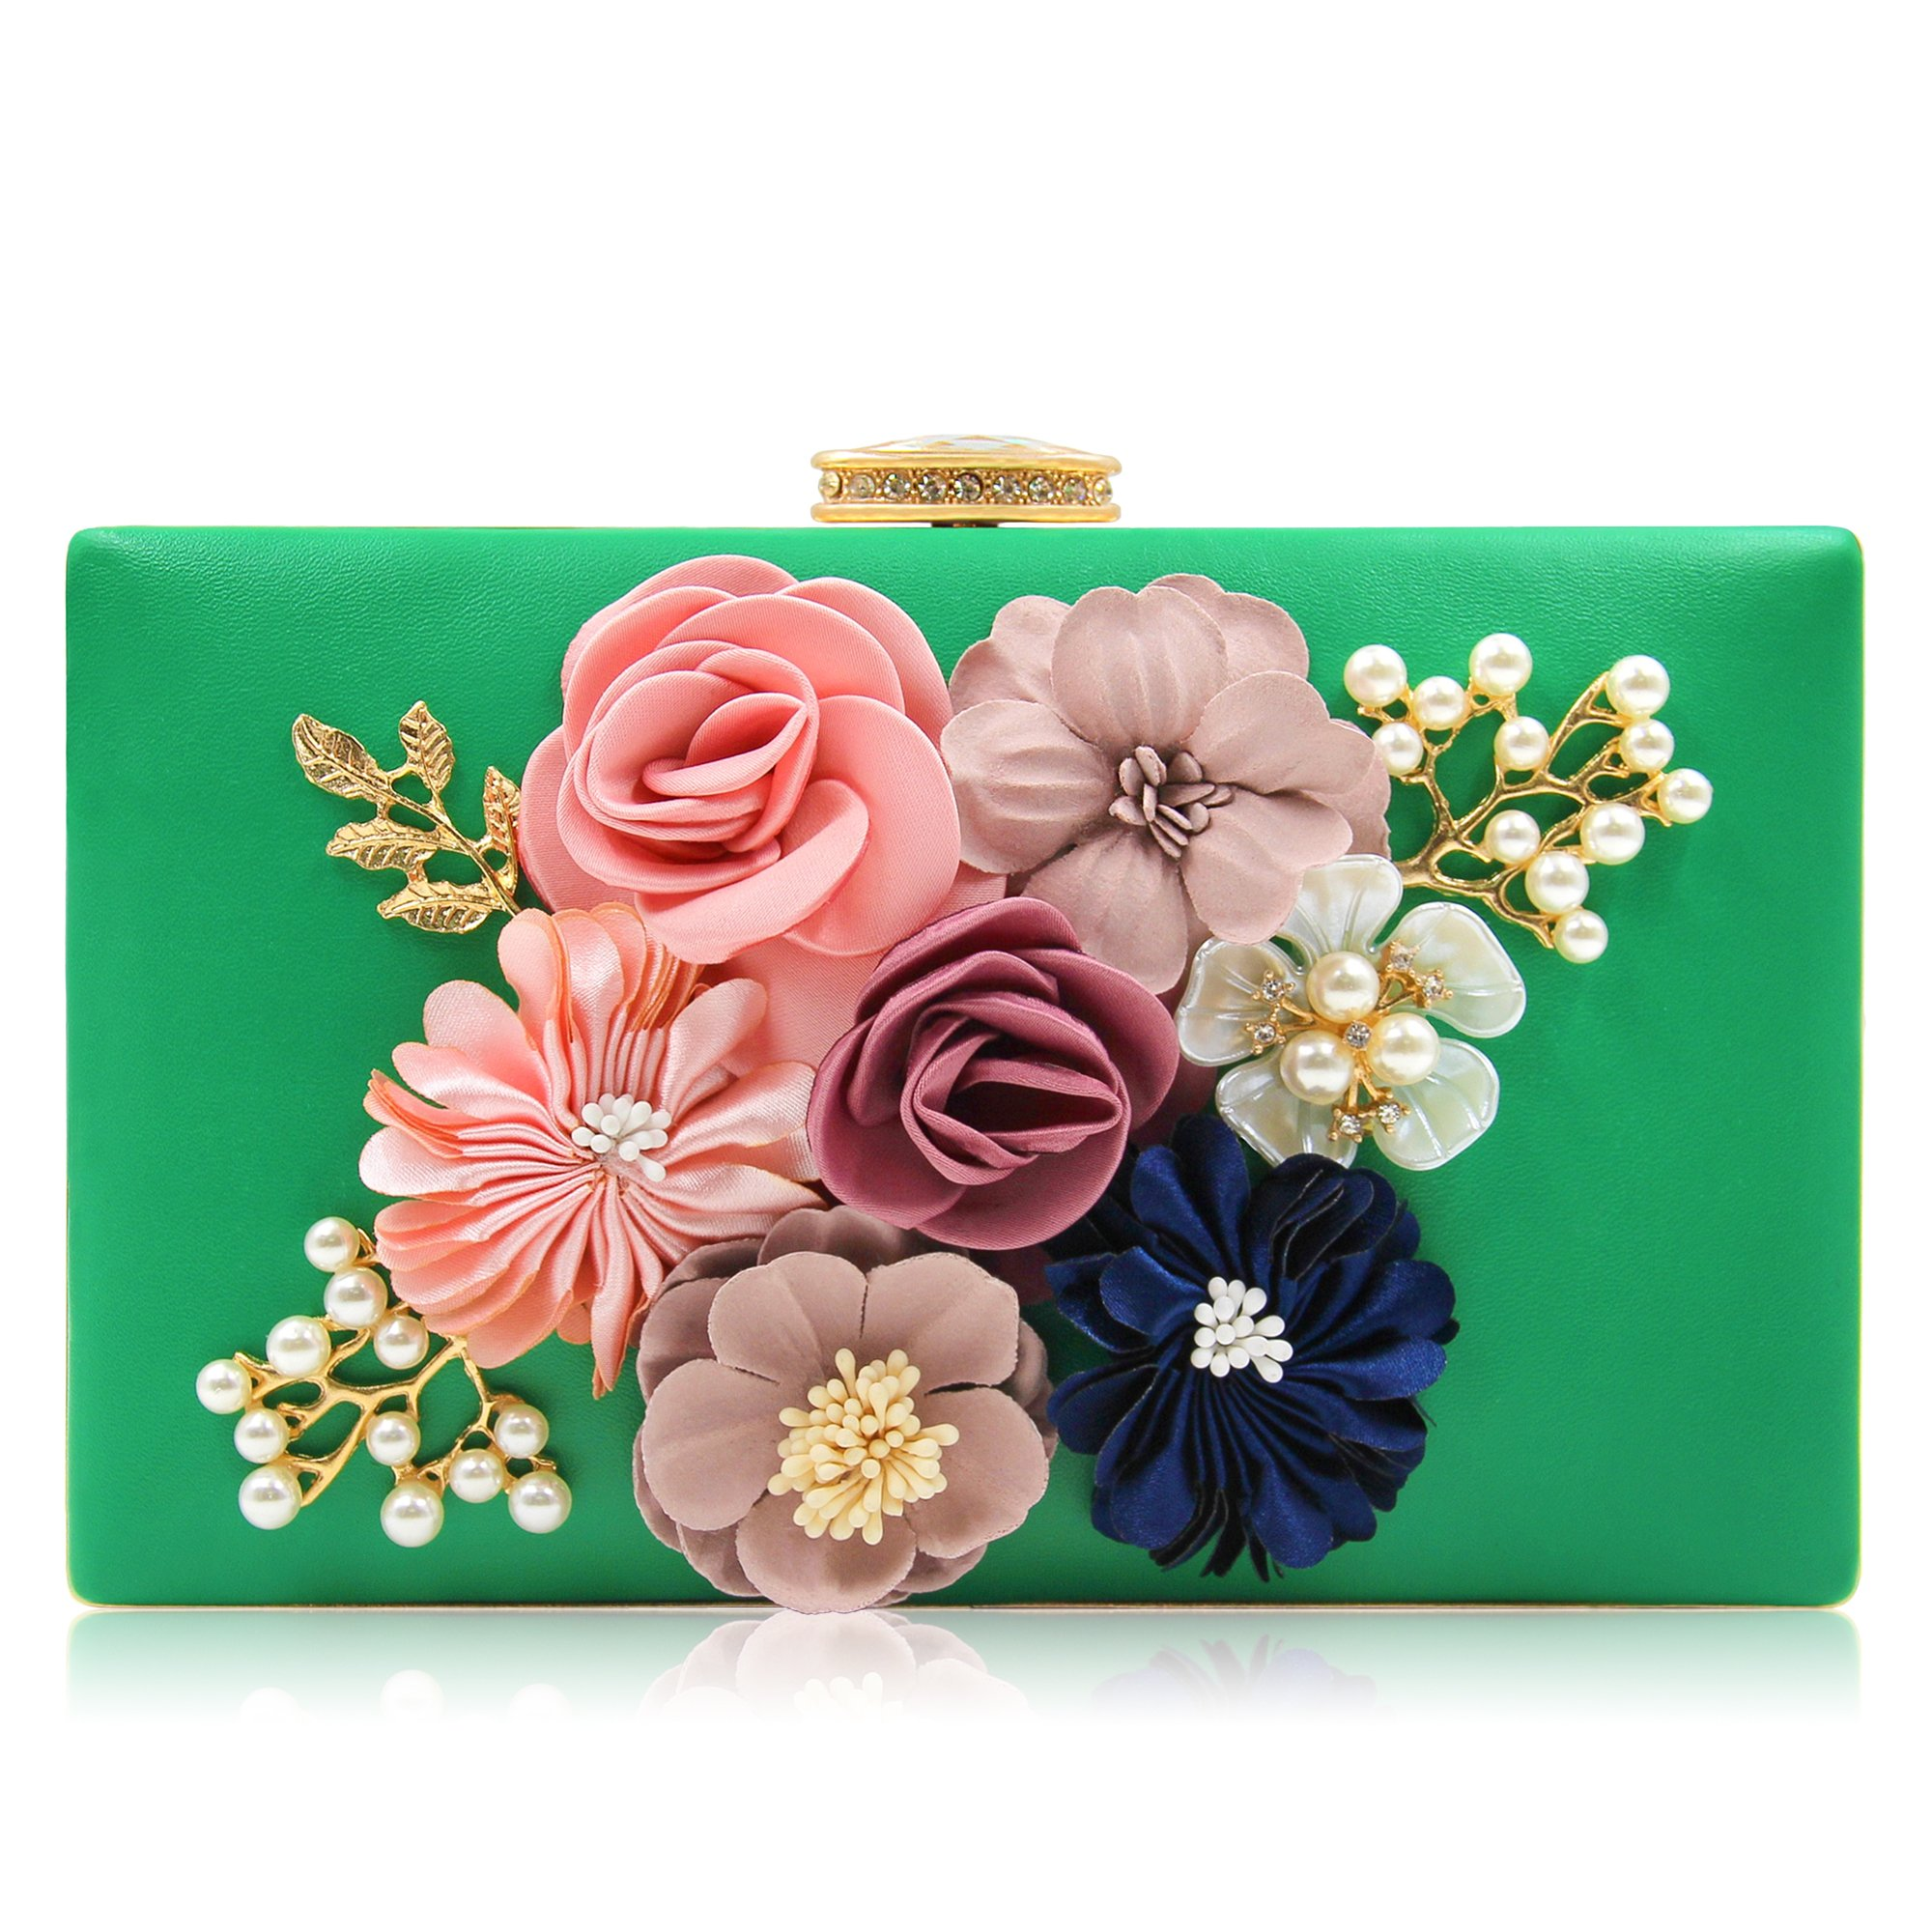 Milisente Women Flower Clutches Evening Bags Handbags Wedding Clutch Purse (Green)